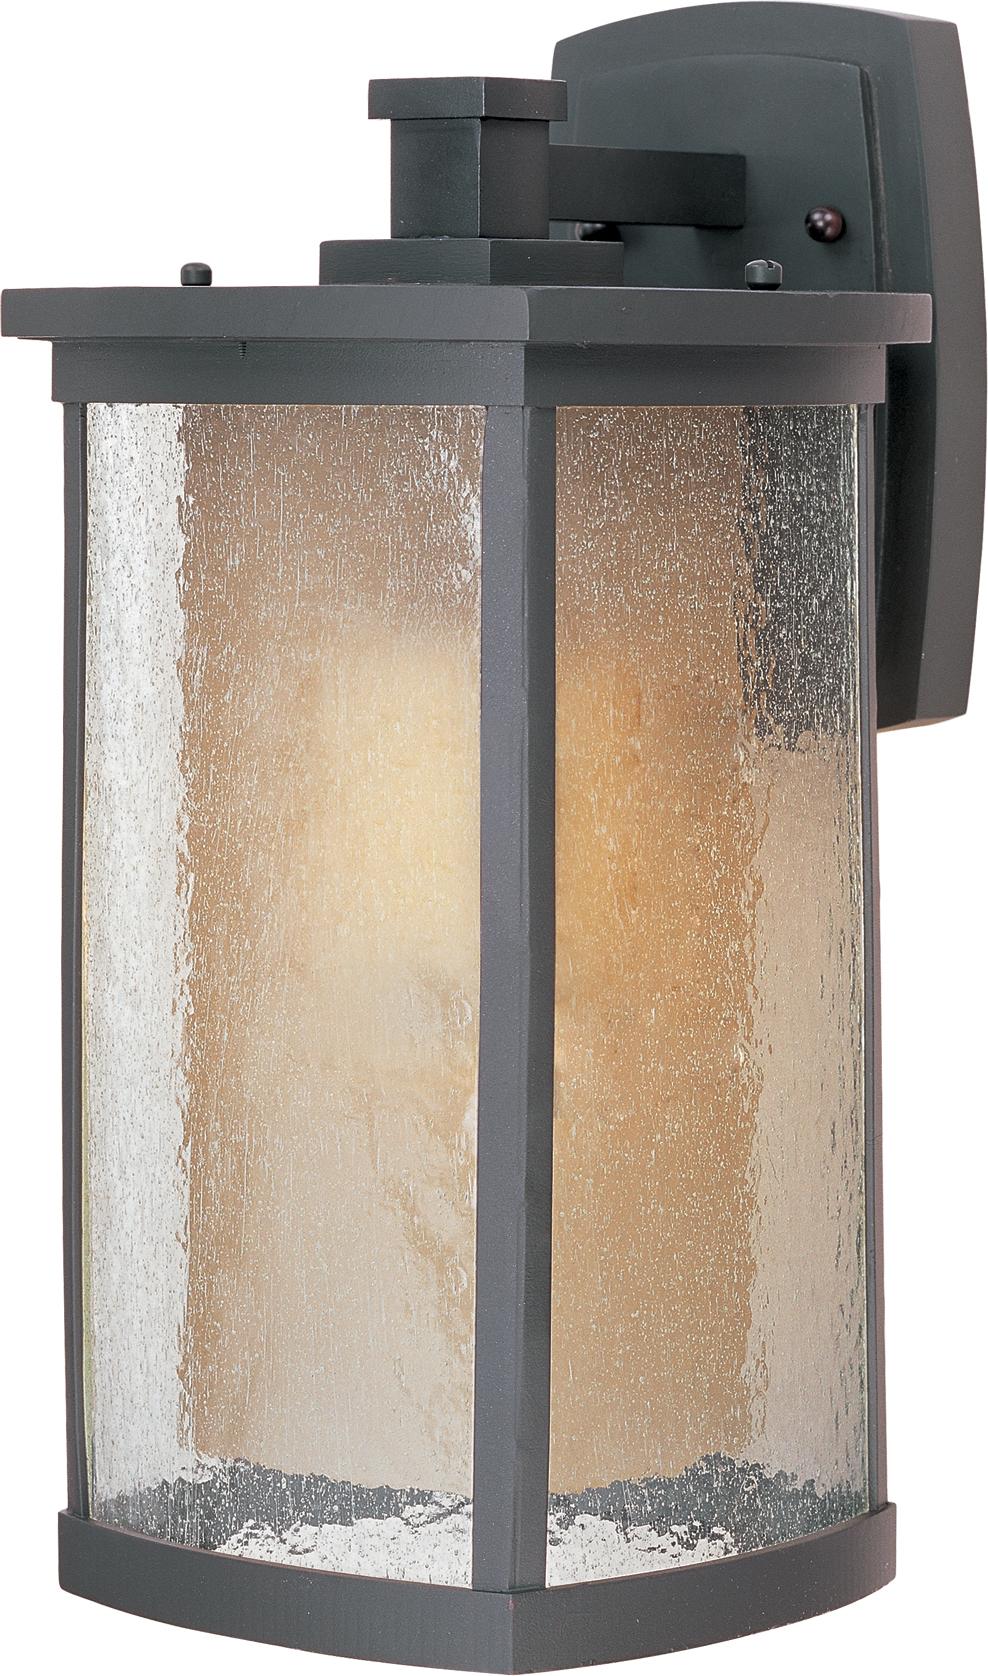 Bungalow LED Wall Lantern | Maxim Lighting